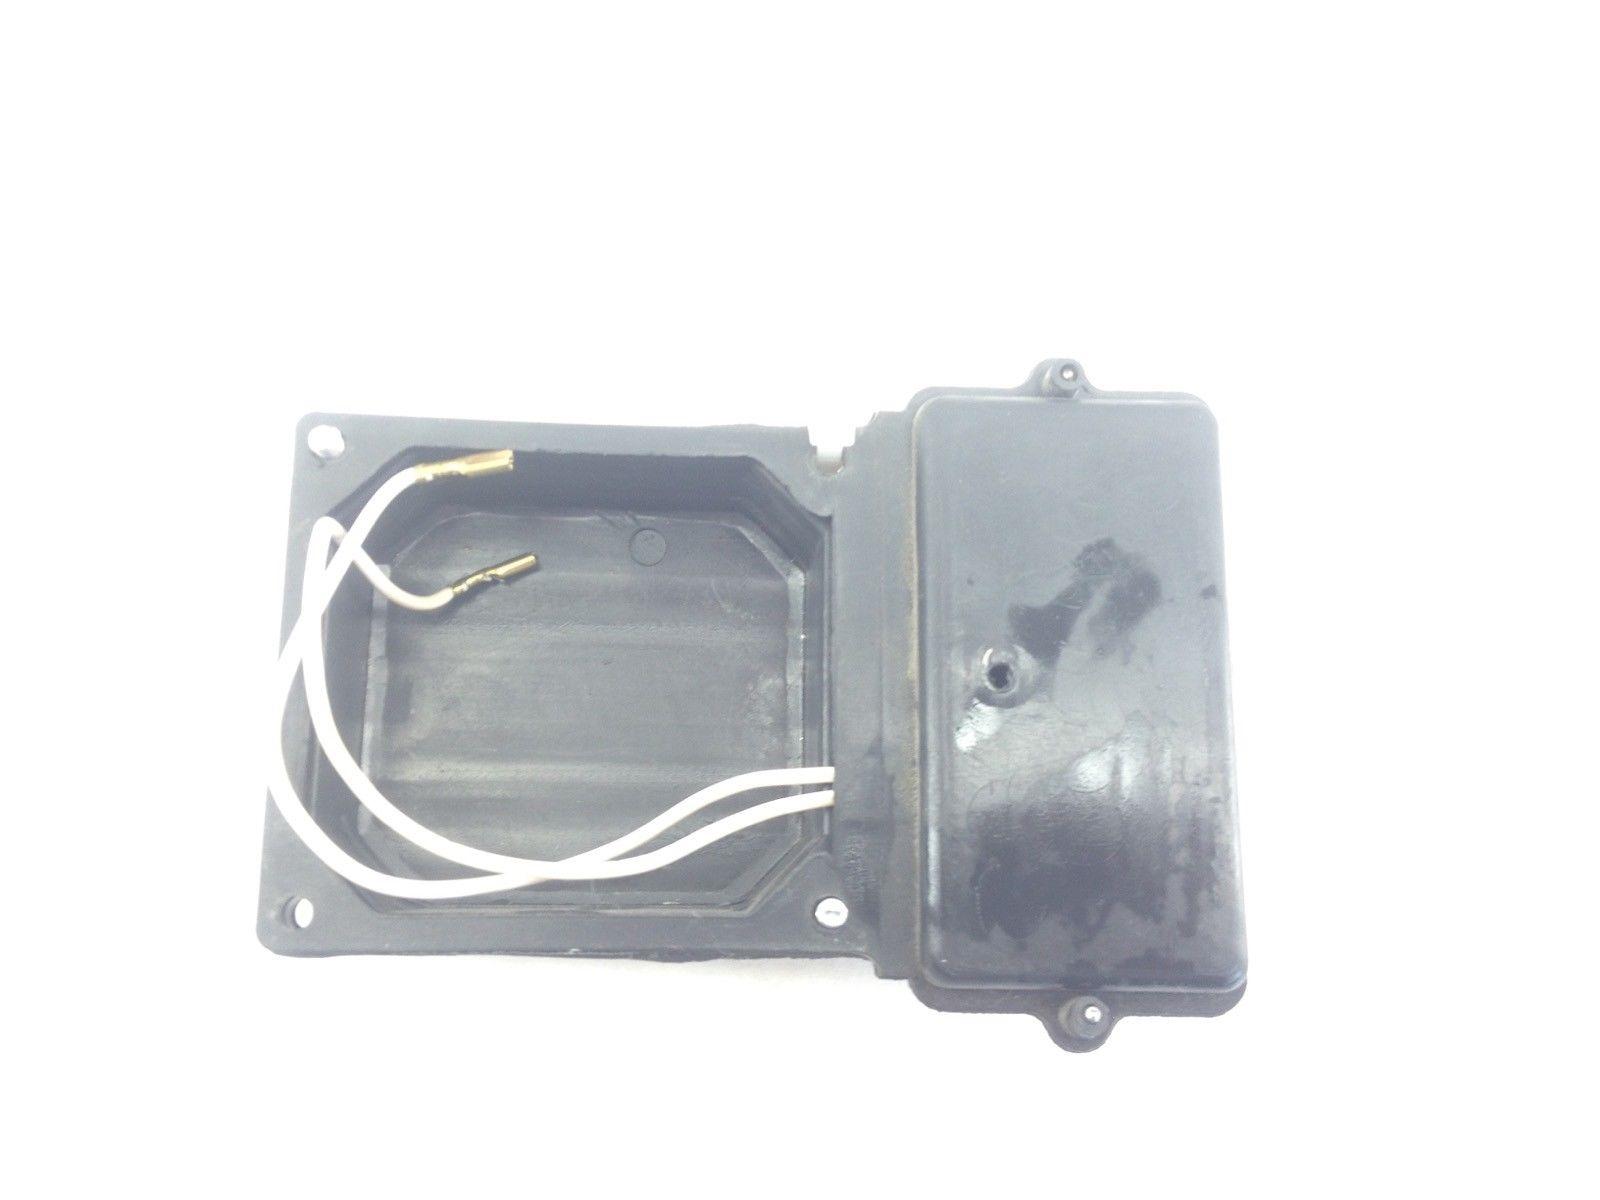 COEL BREVETTATO TERMINAL BOX with MECO CMI-4-634 ELECTRIC CAPACITOR (H3) 2